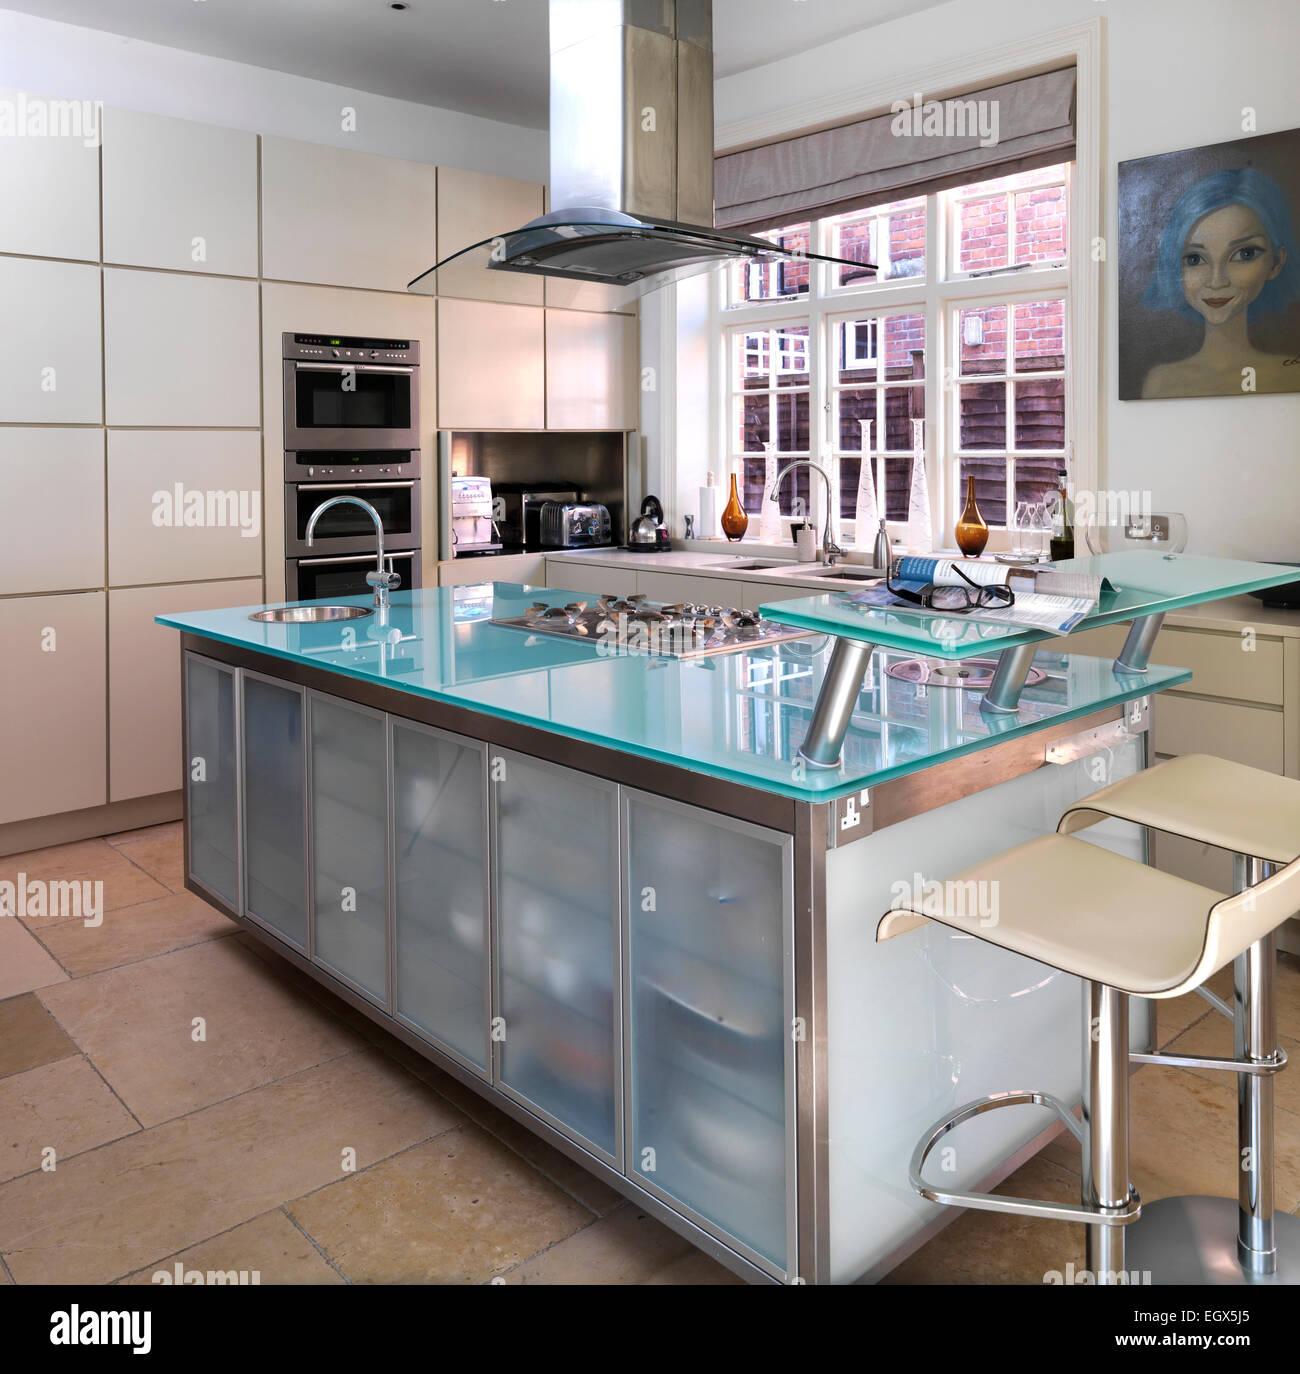 Bar Stools At Breakfast Bar In Modern Kitchen Uk Home